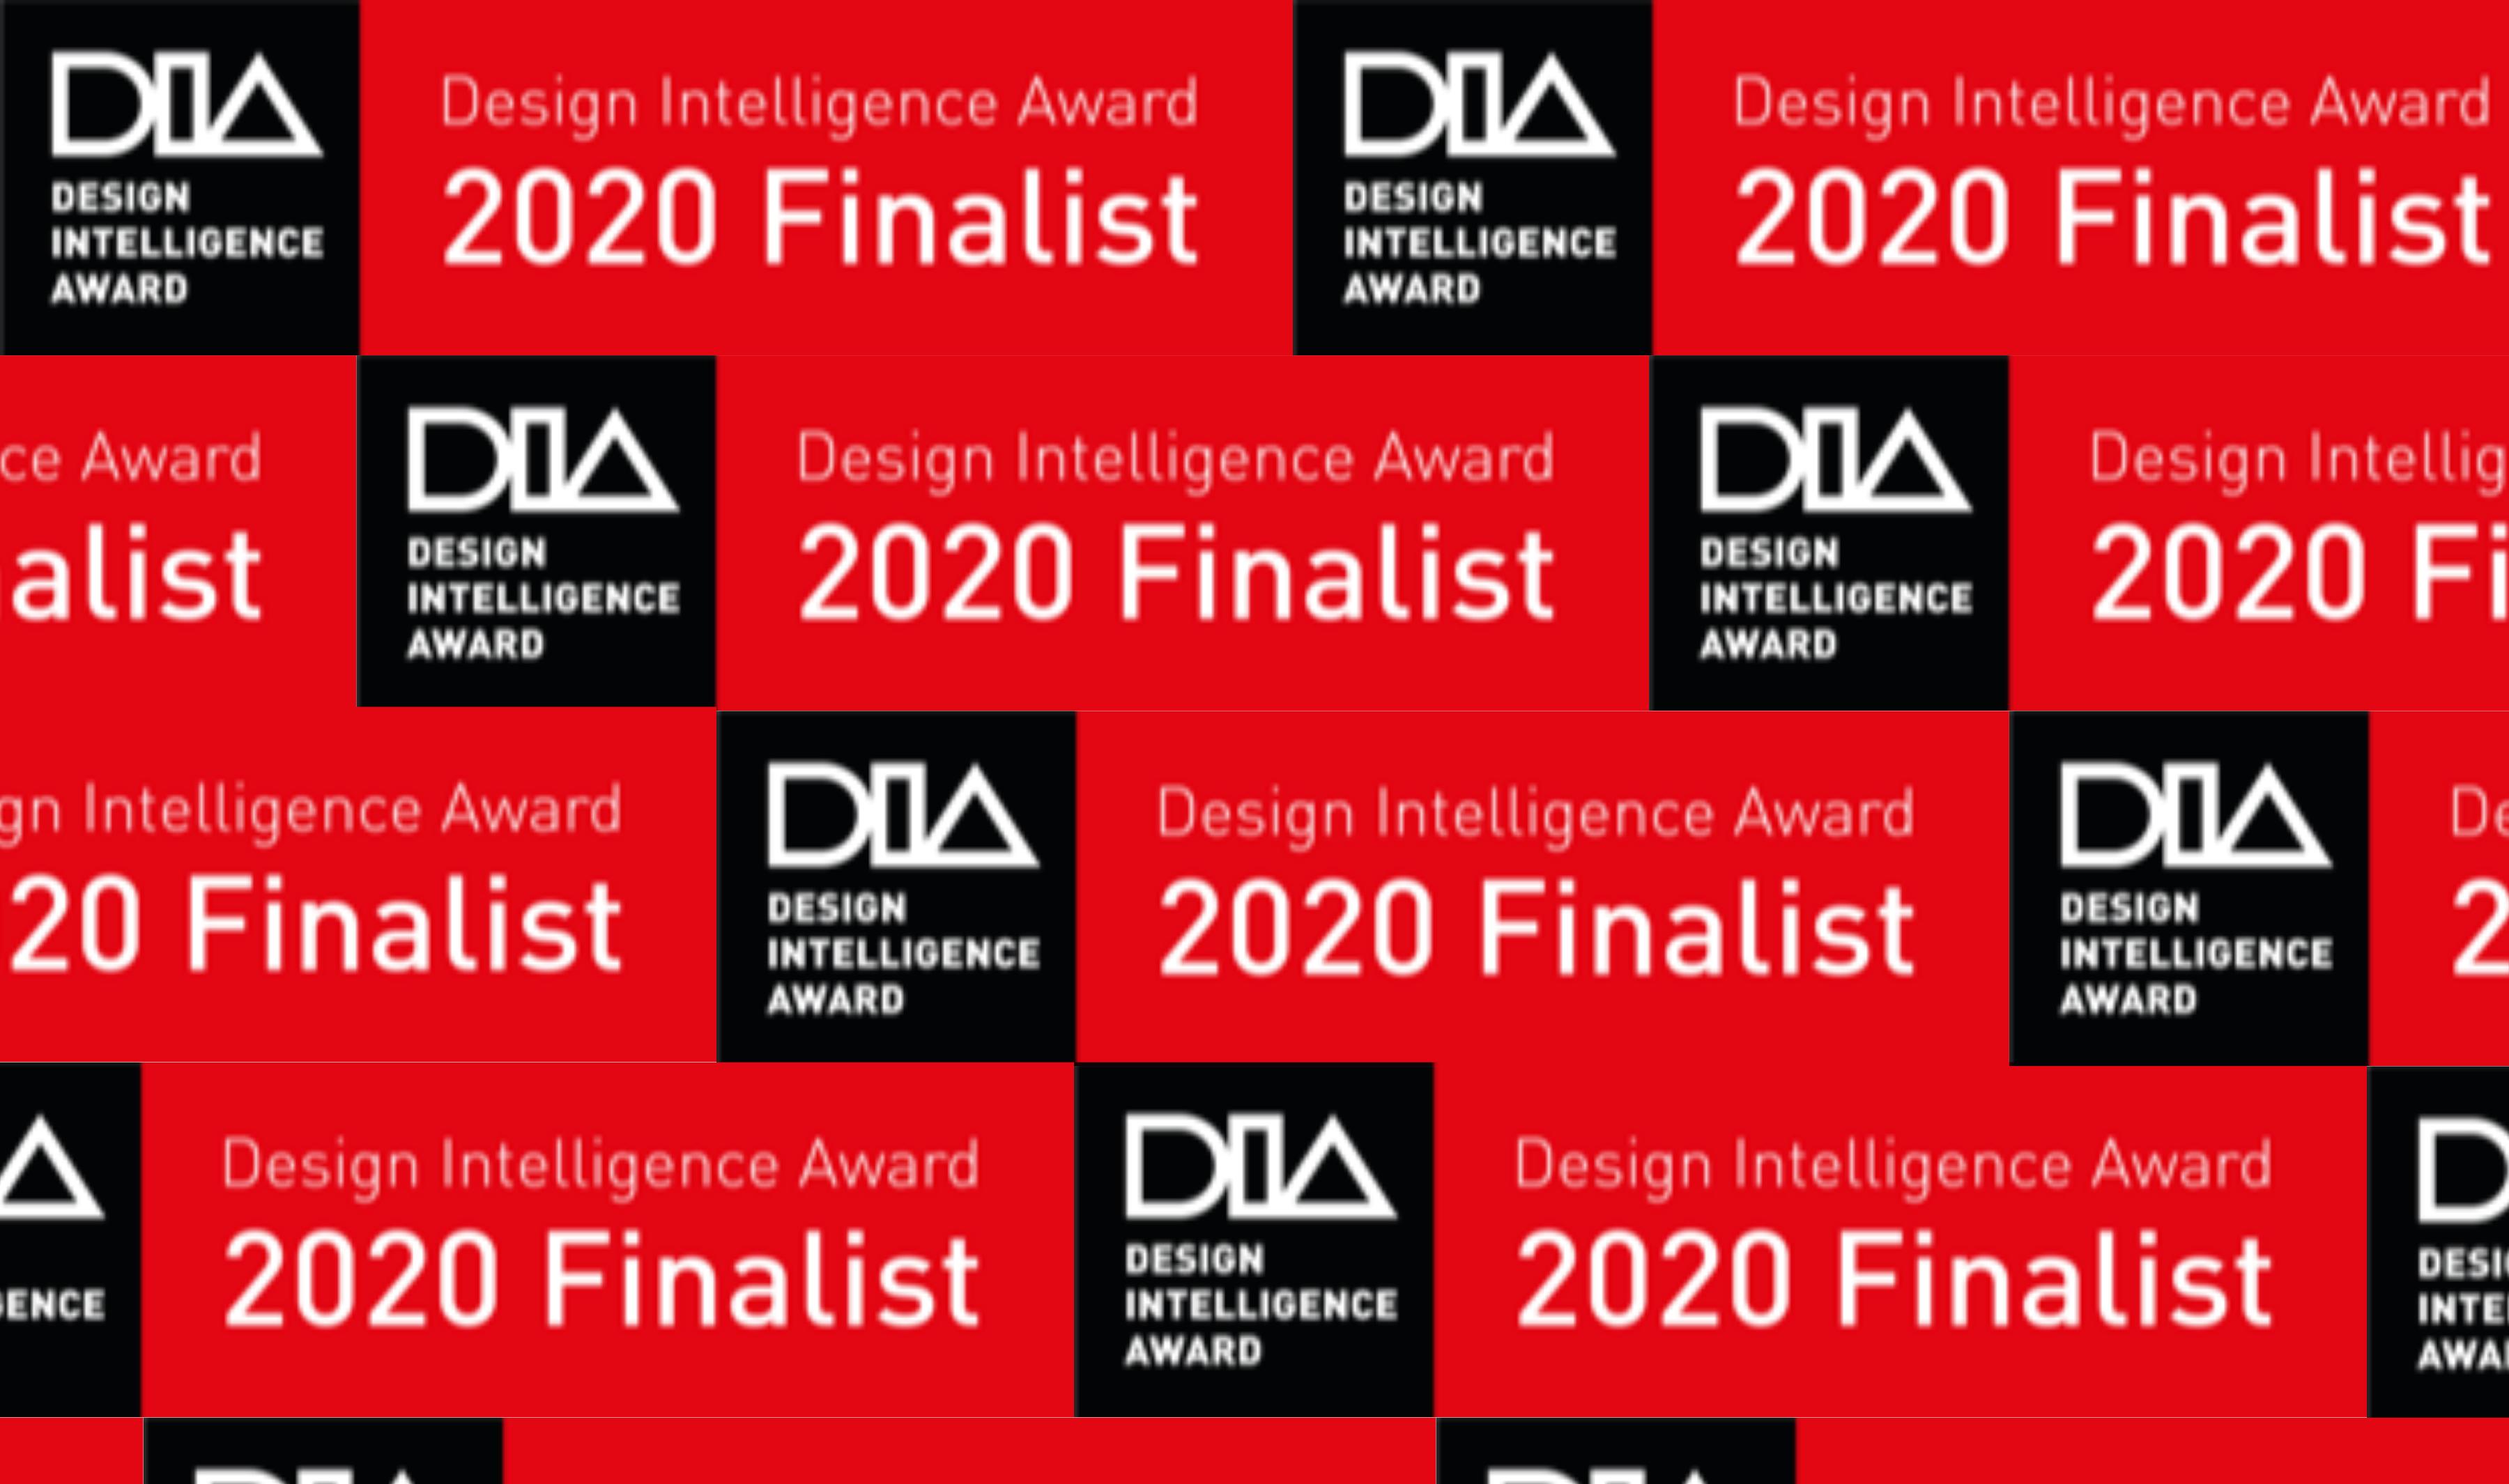 ELSE receives honourable  mention at the 2020 Design Intelligence Awards